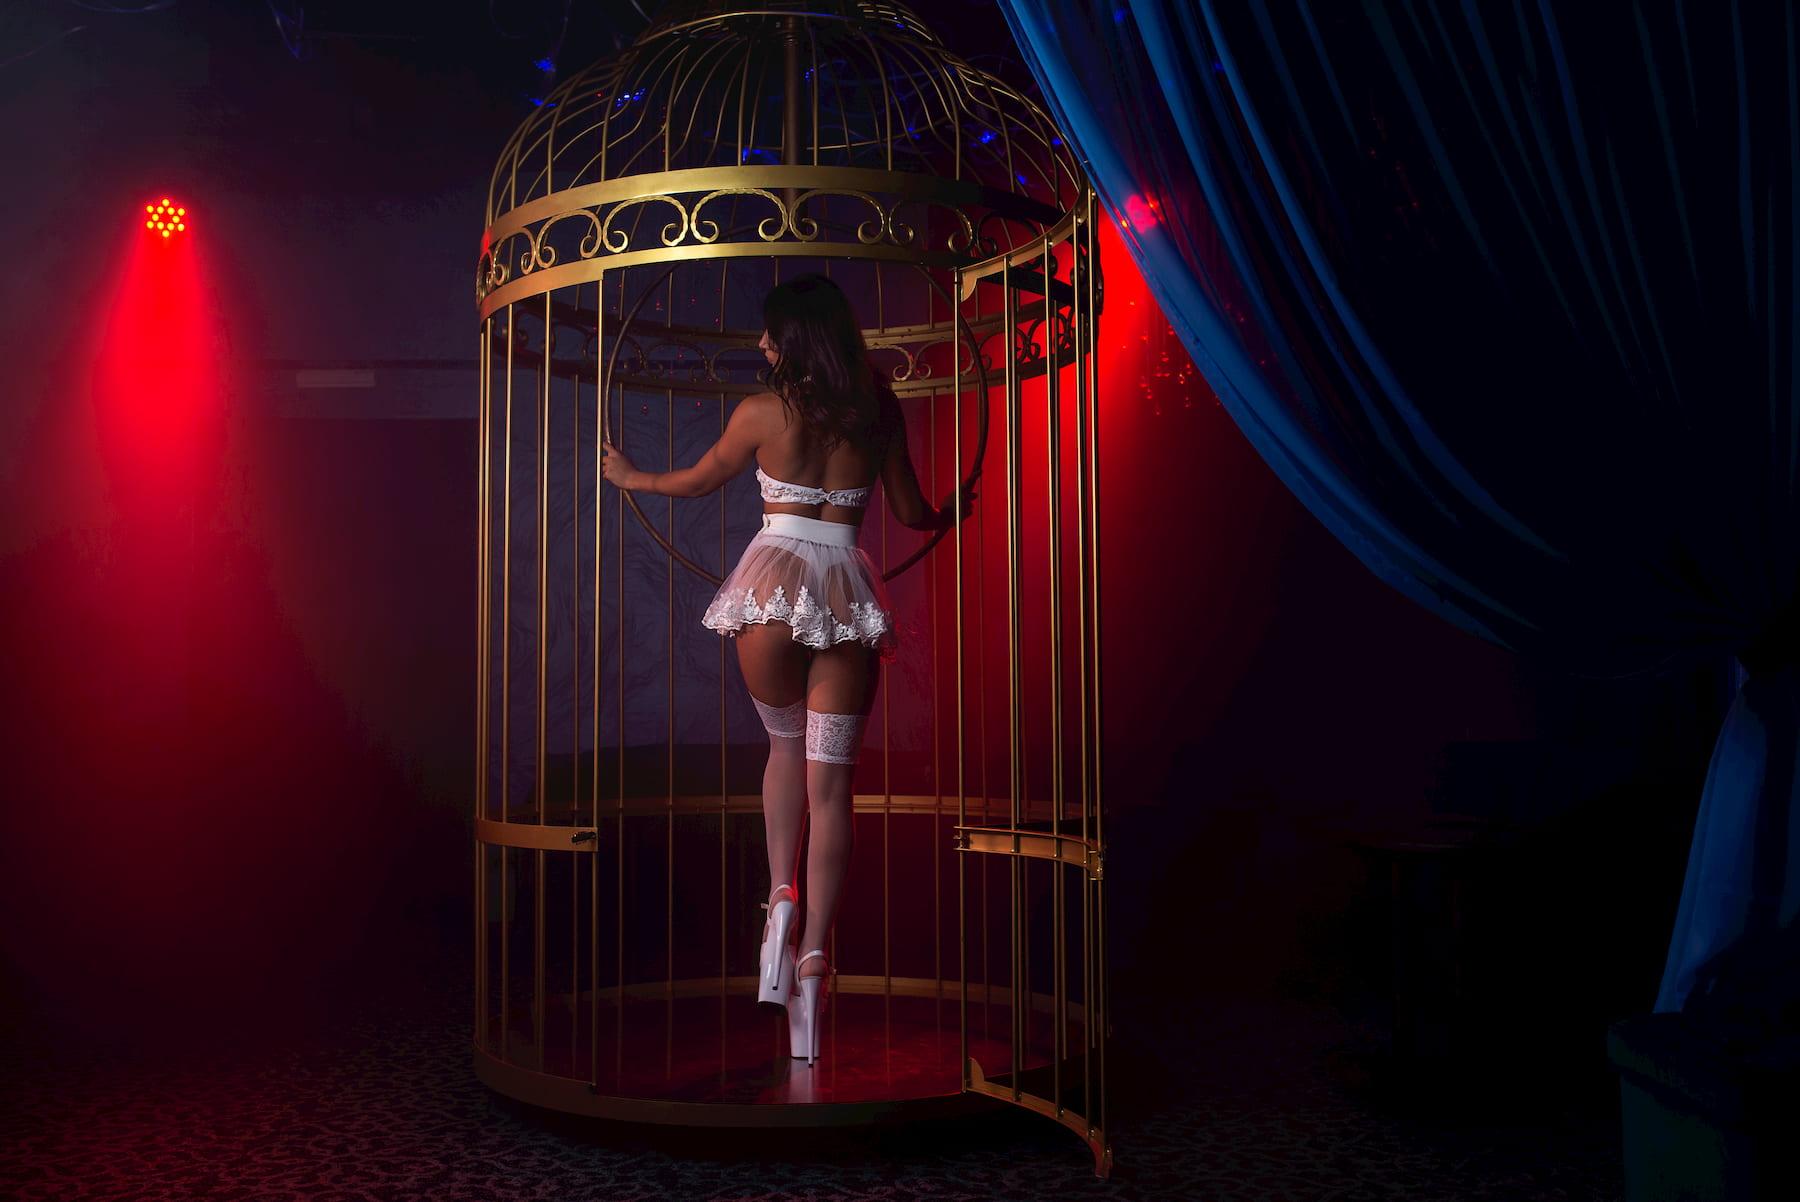 Pole dance in strip club